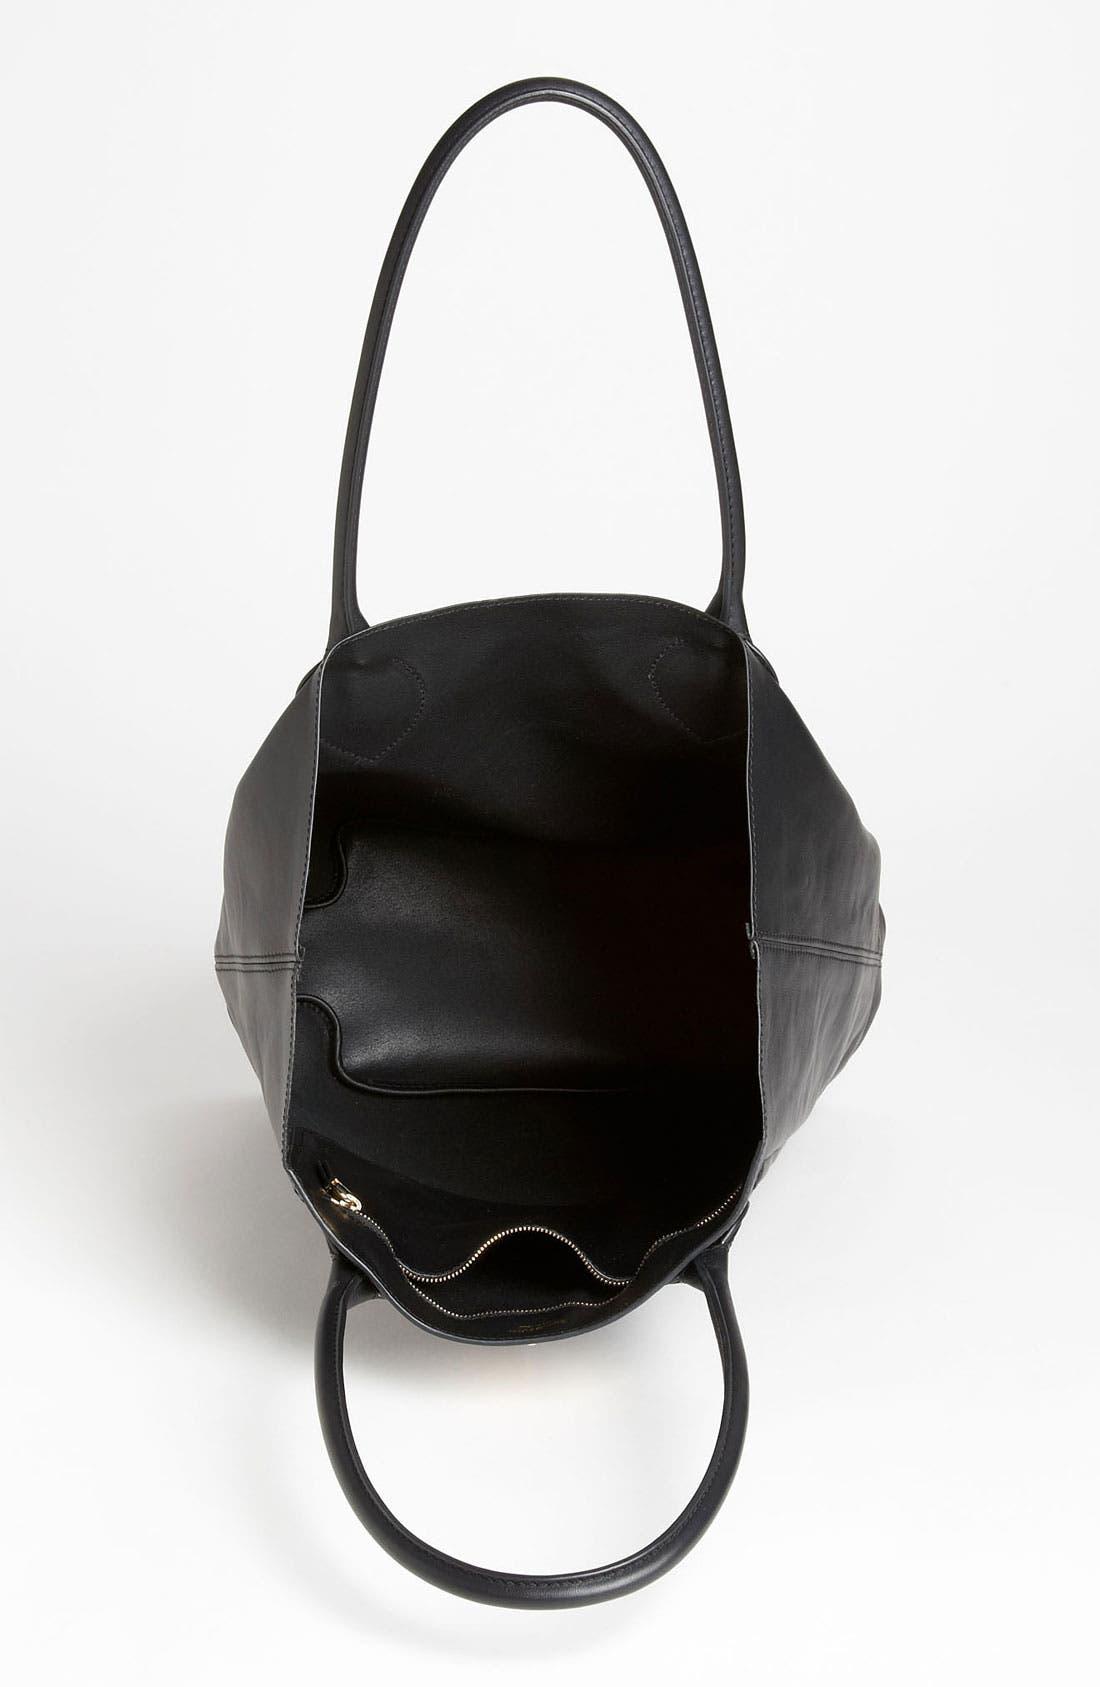 Alternate Image 3  - Emilio Pucci Leather Tote